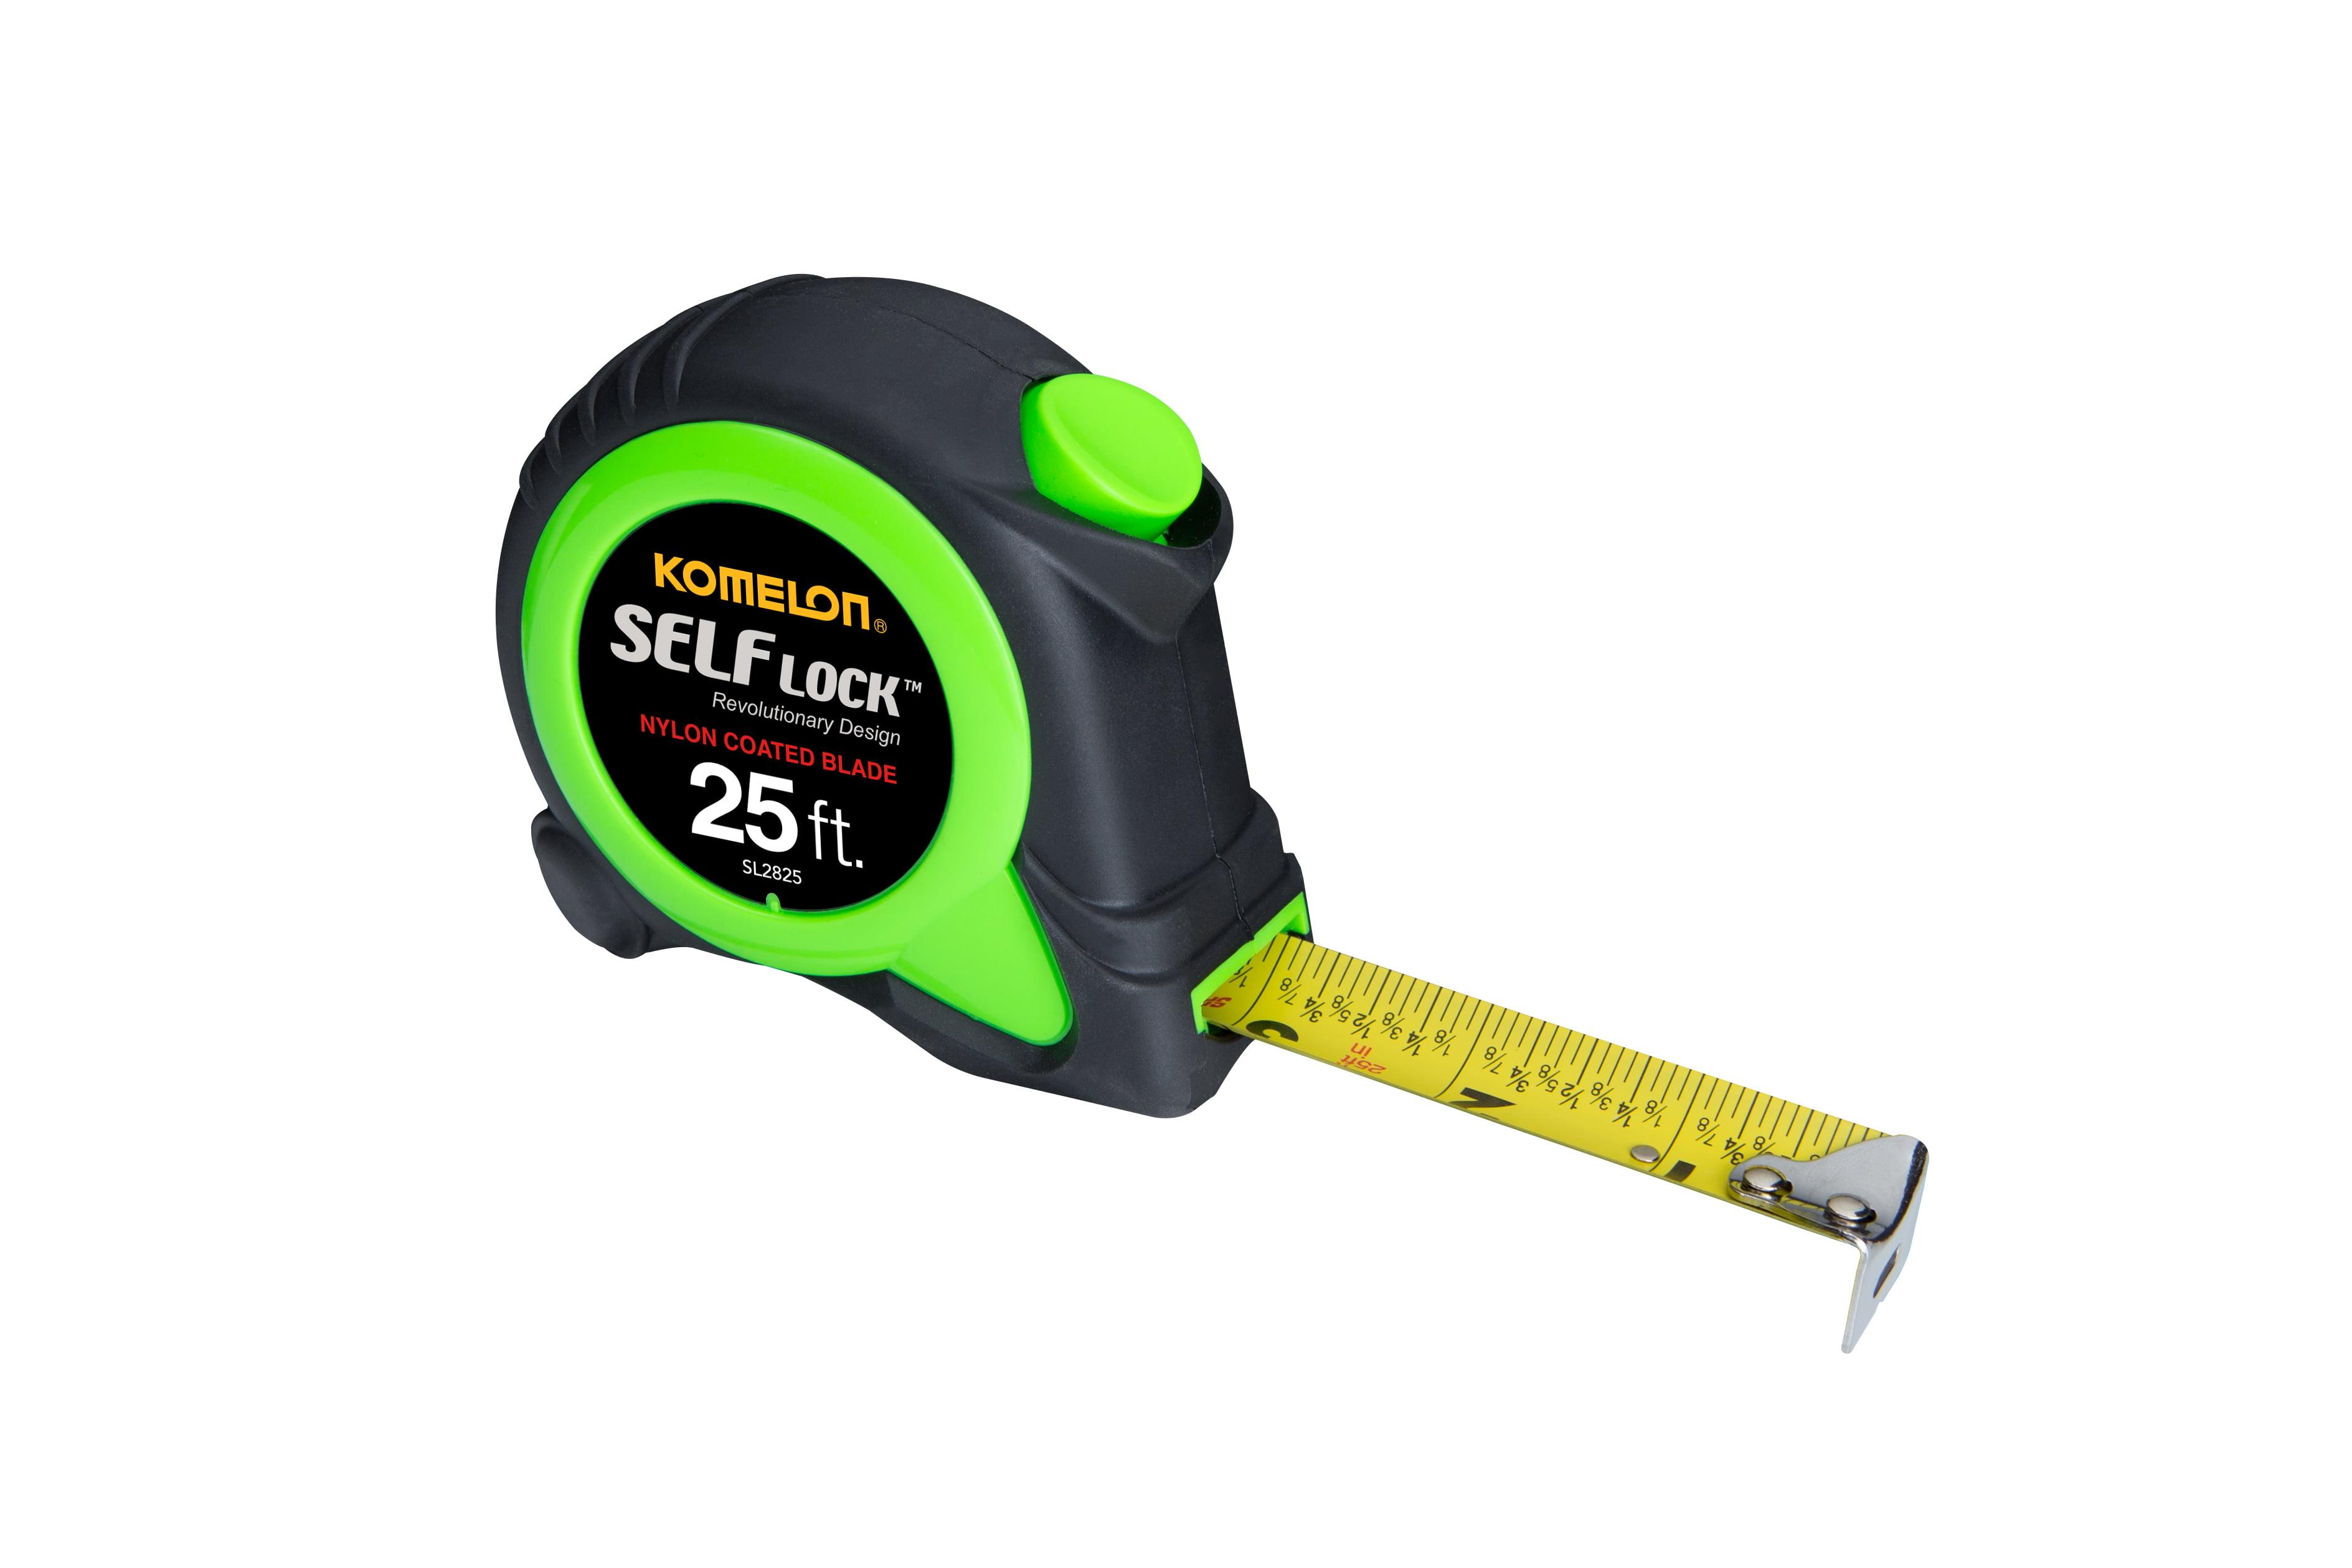 Komelon Self Lock Premium 25 ft Green Nylon Coated Blade Tape Measure by Komelon